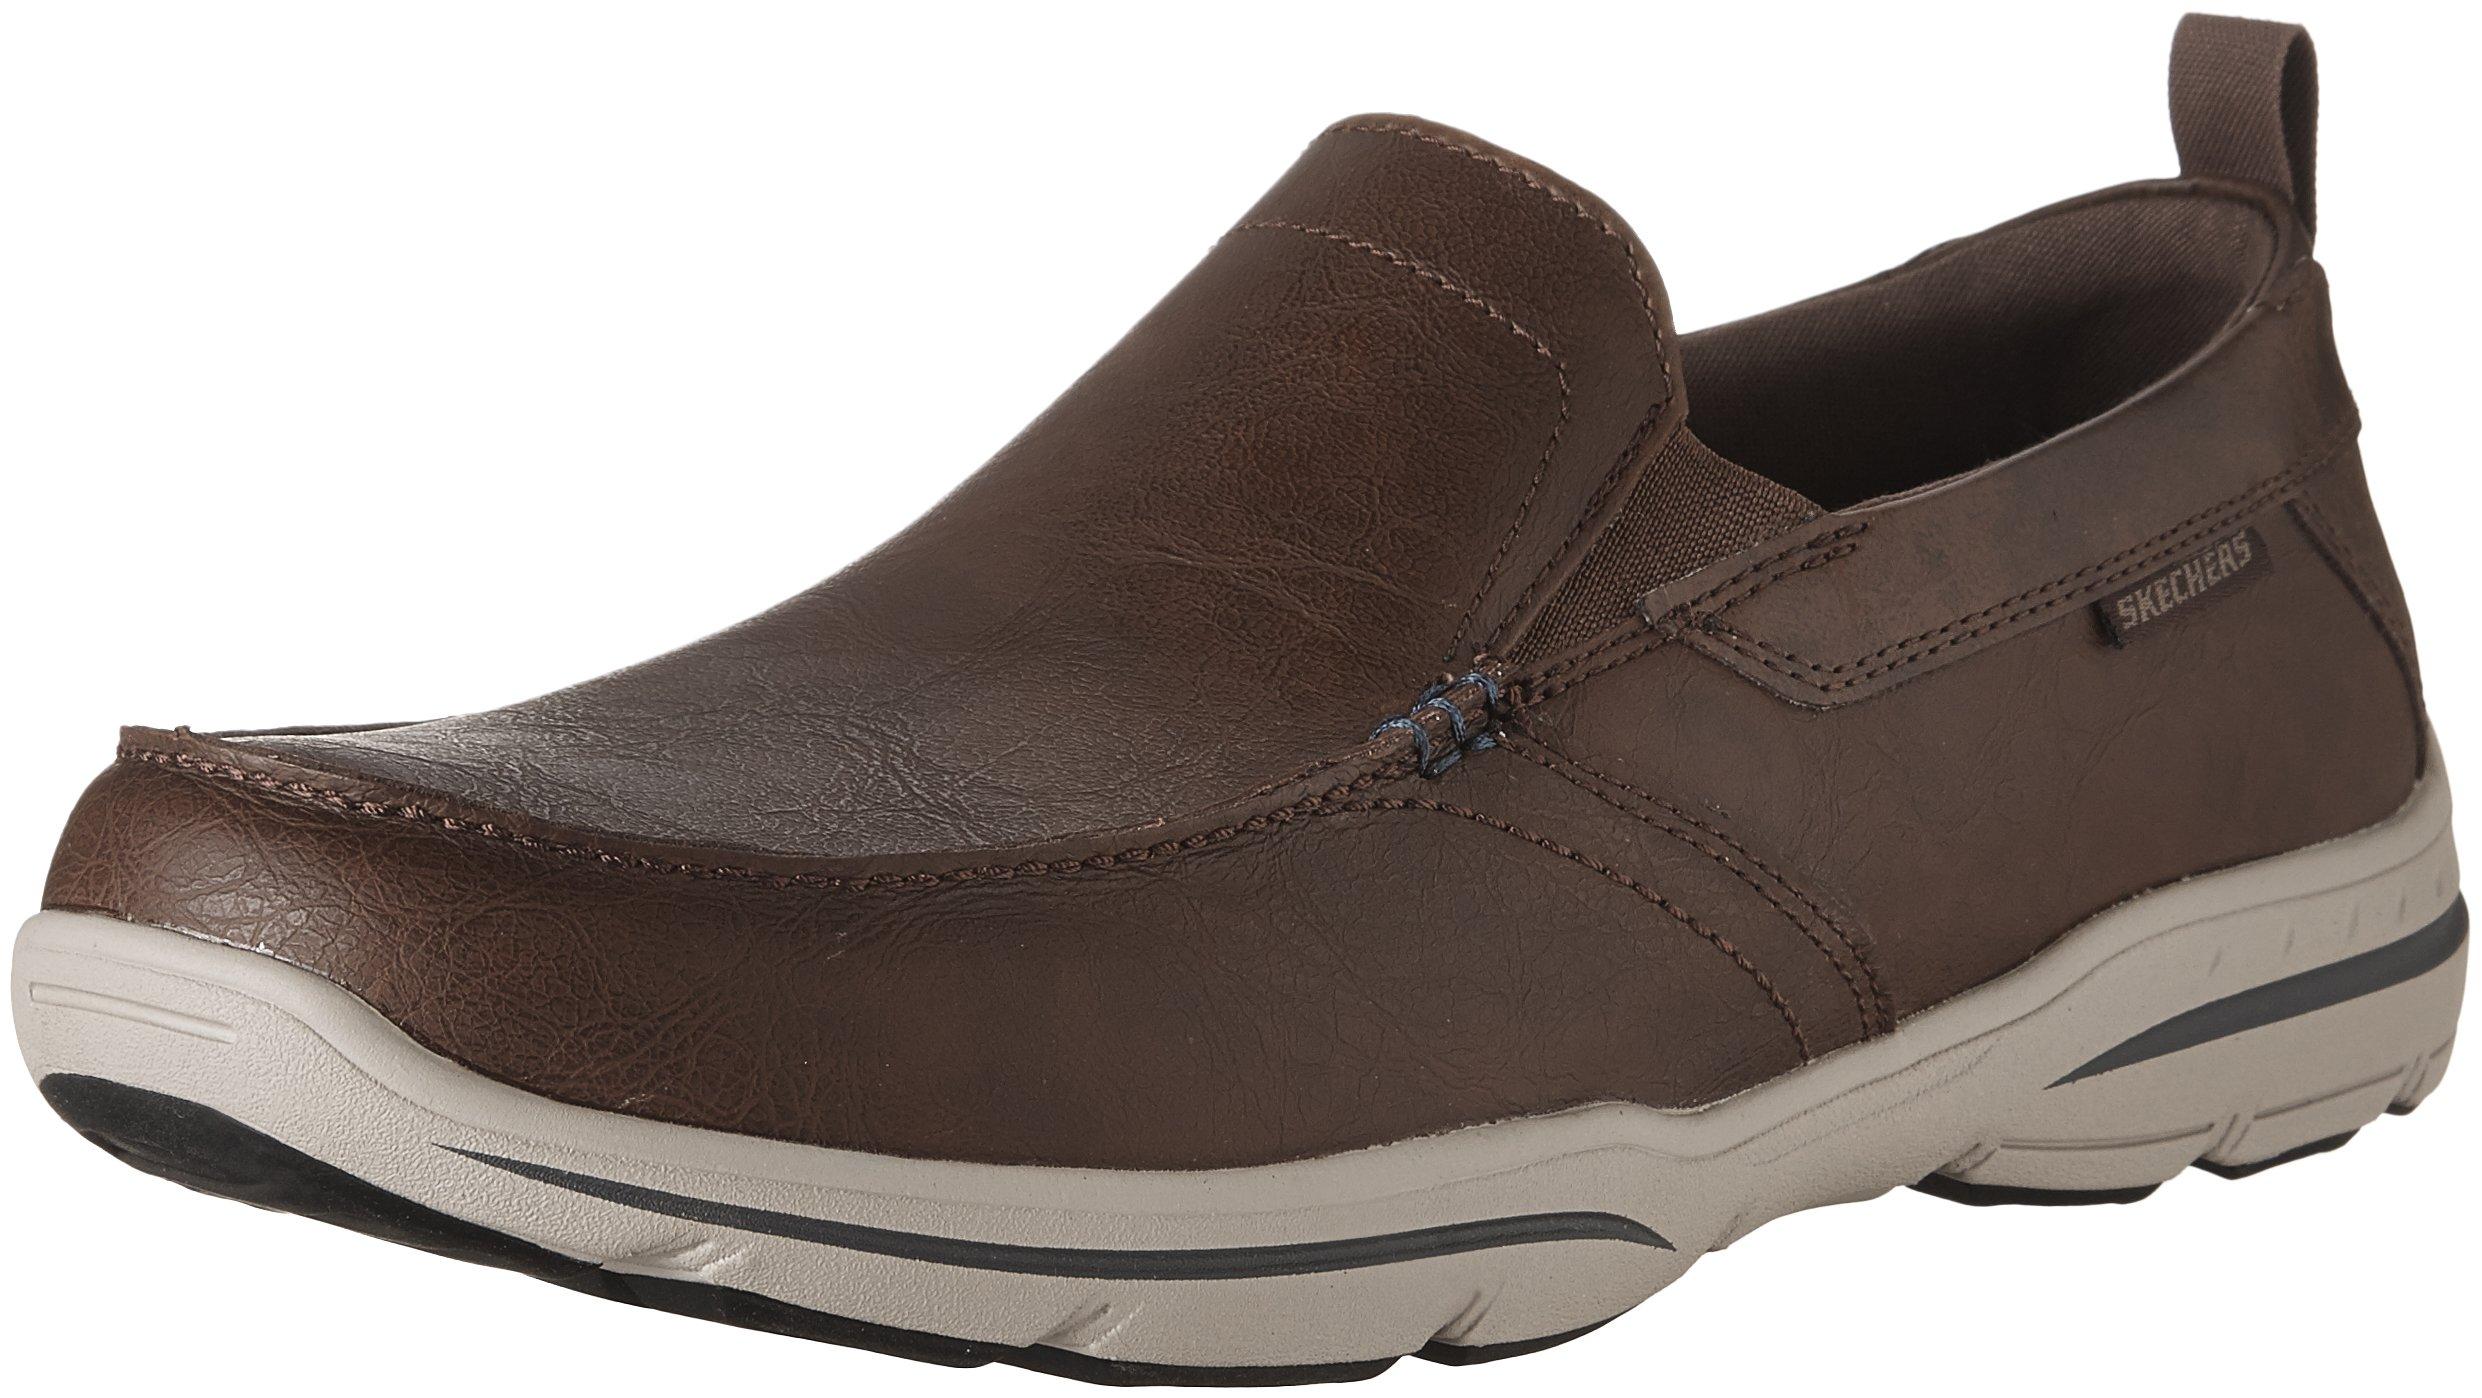 Skechers Men's Harper-Forde Driving Style Loafer, Chocolate, 9.5 Medium US